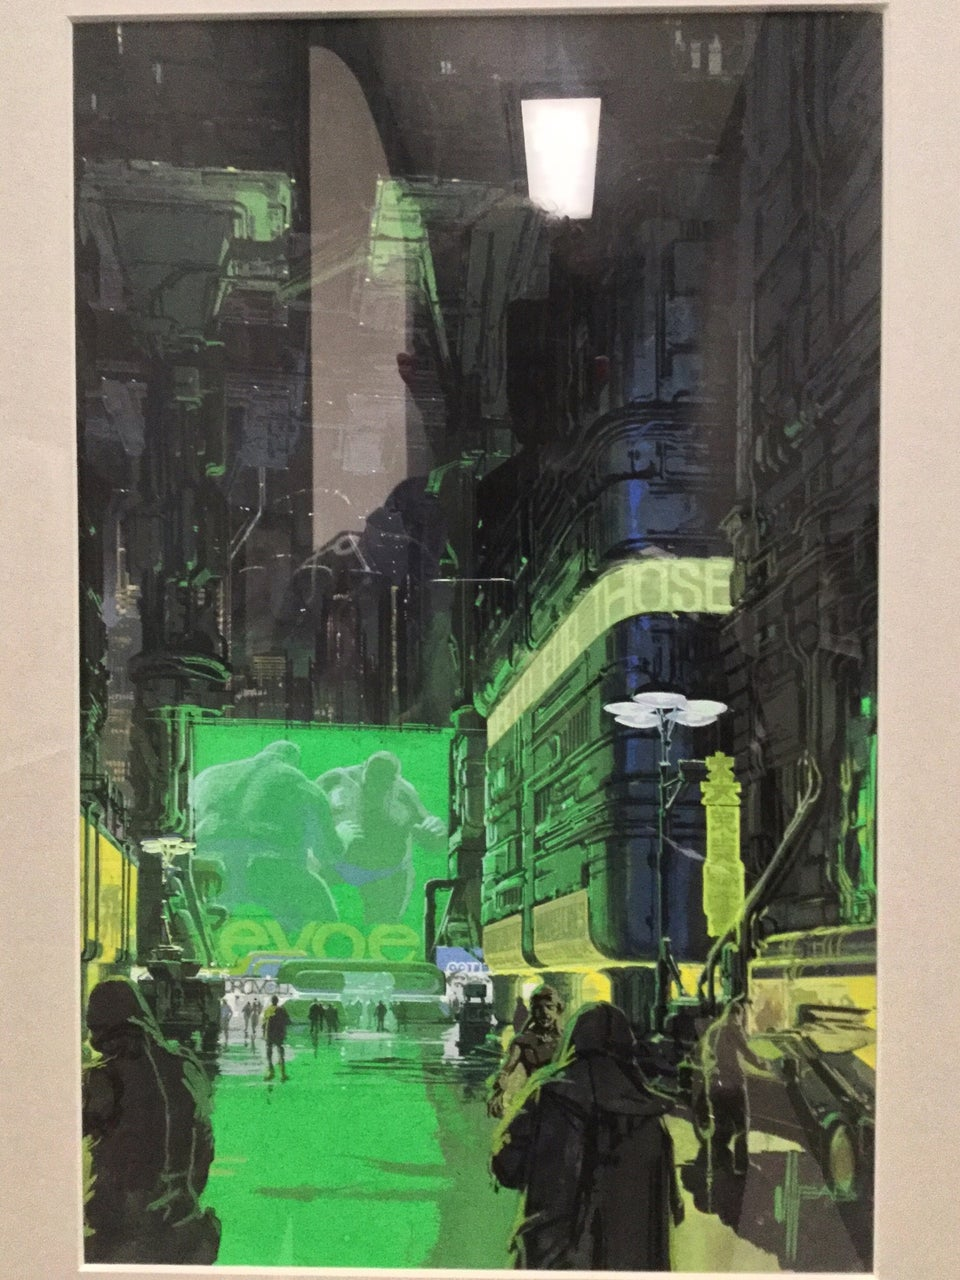 Photorealistic painting of a future urban street scene.